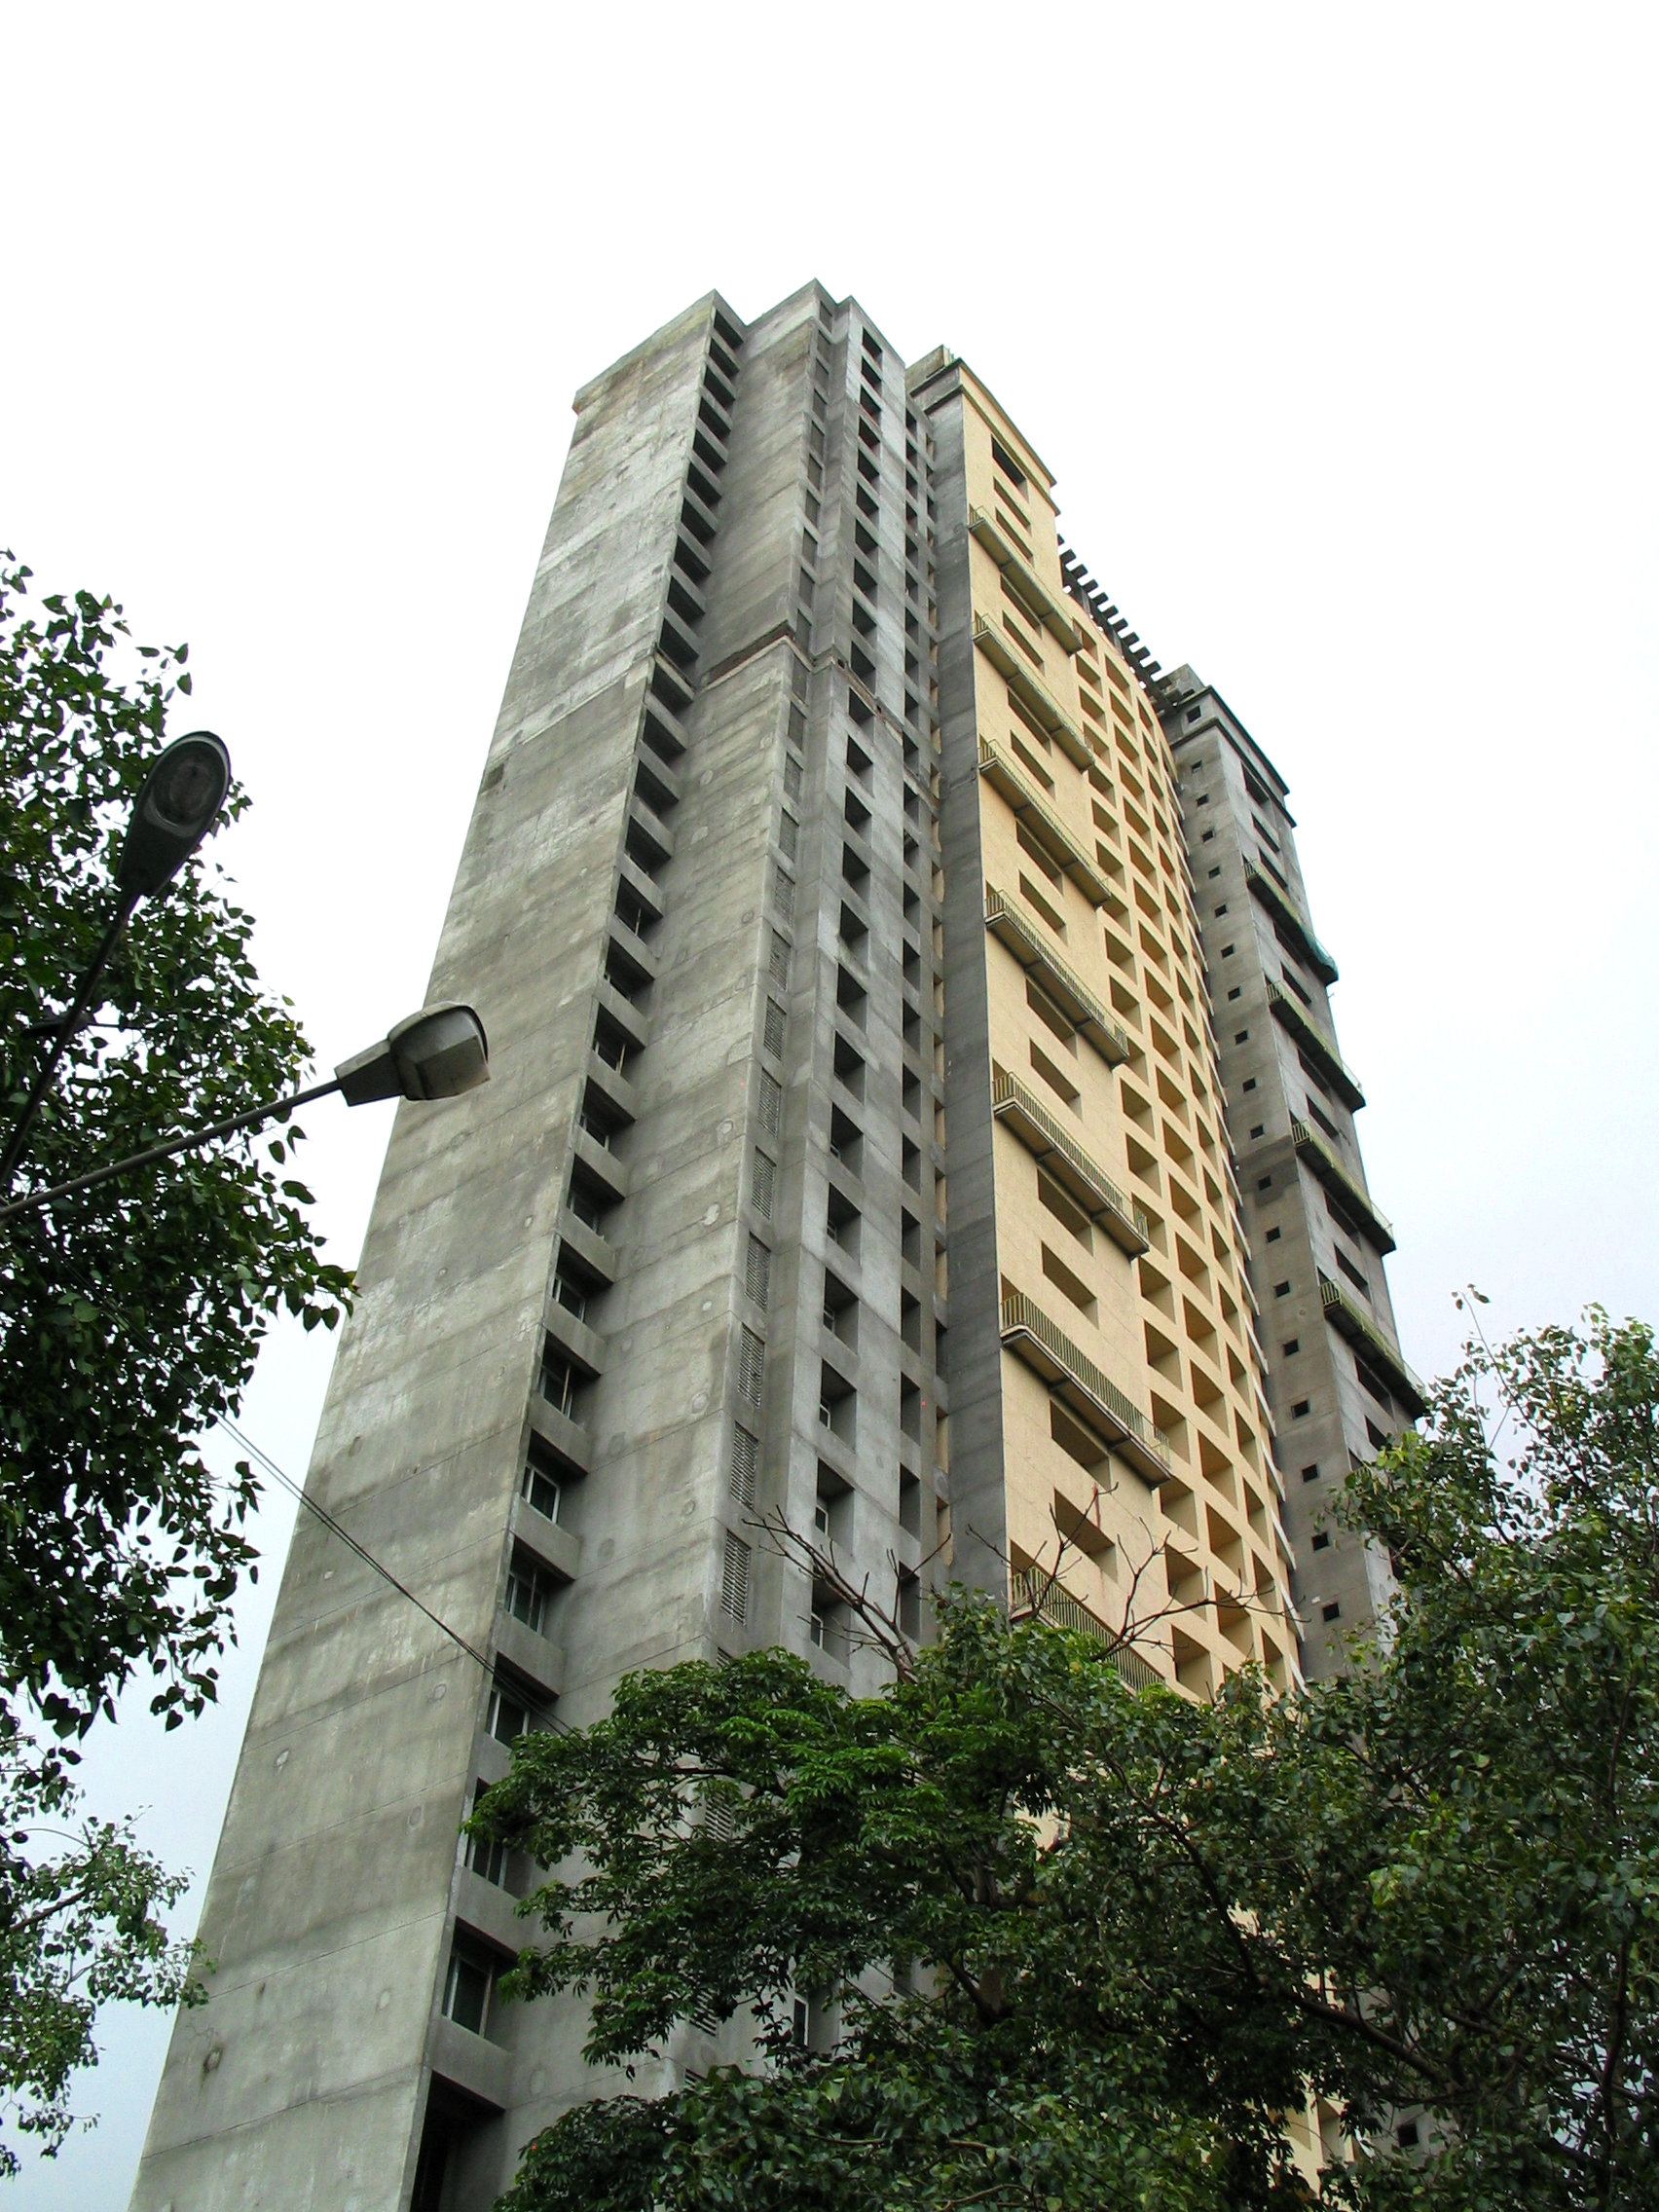 adarsh housing society scam wikipedia